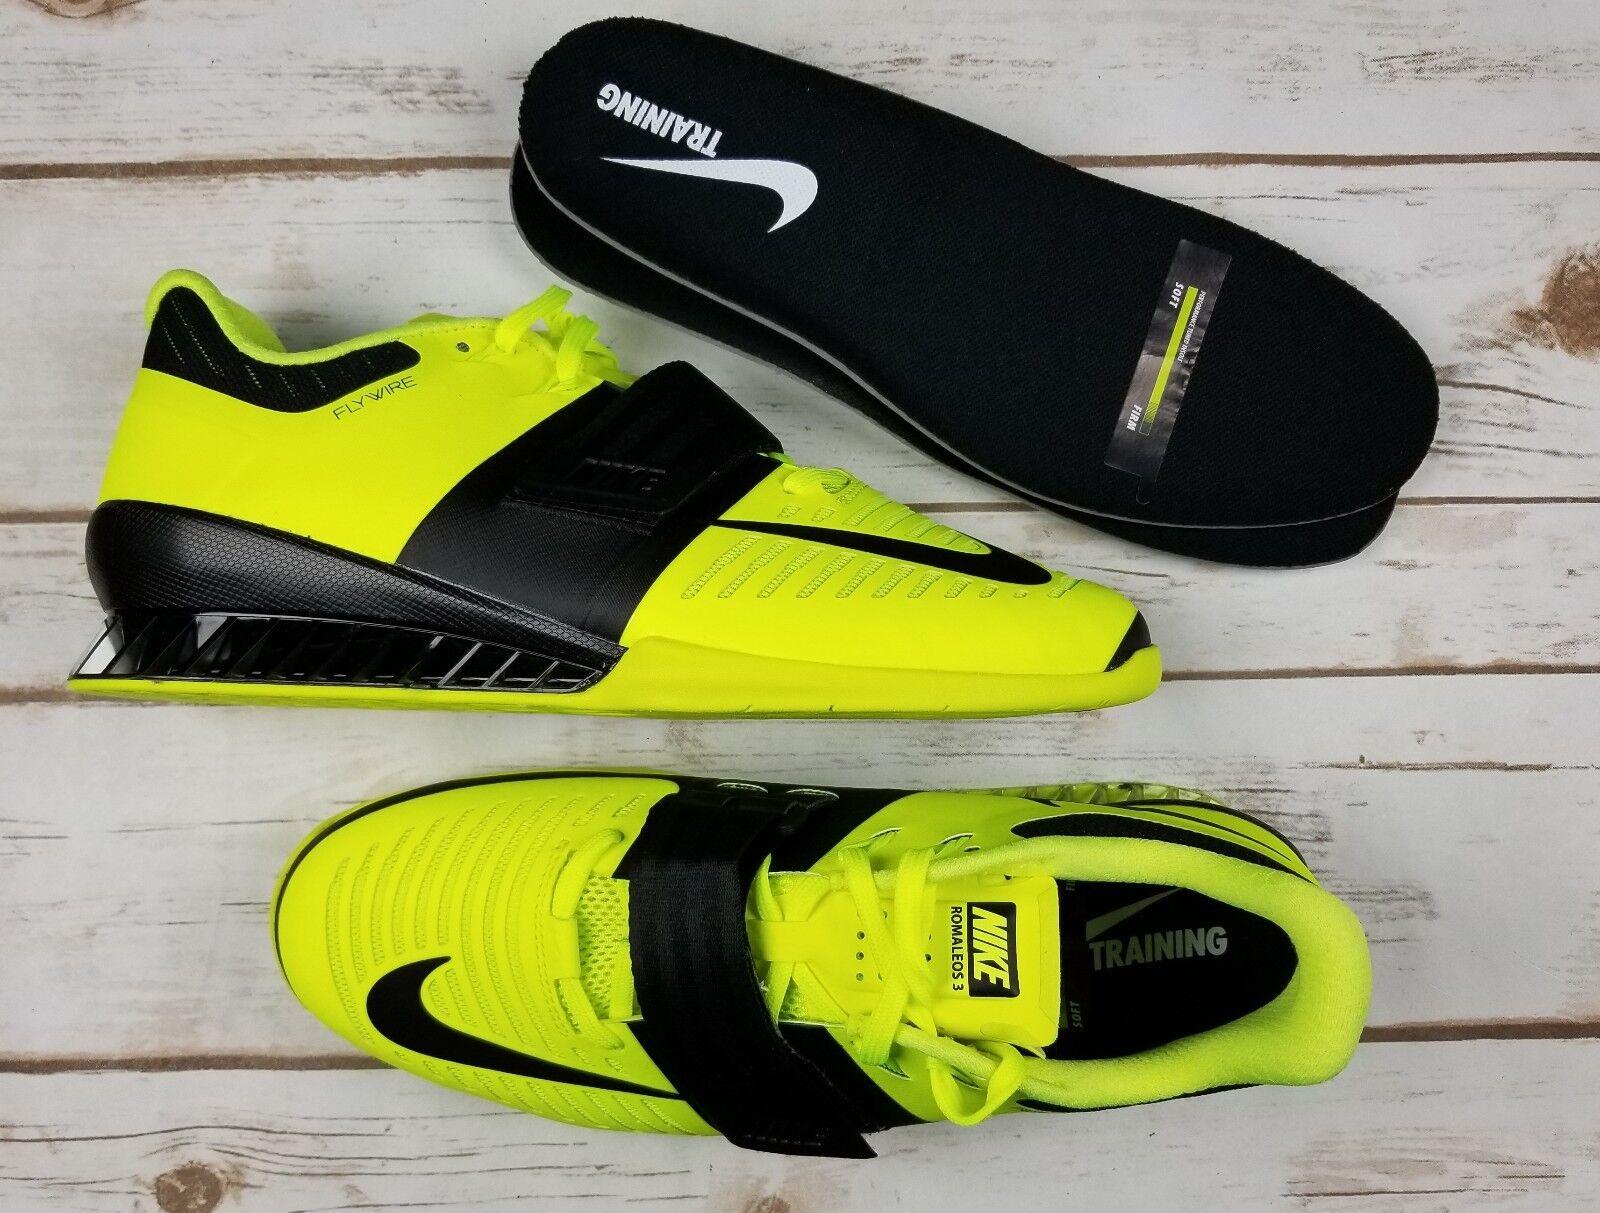 NIKE Romaleos Volt Black Weightlifting Shoe 852933 700 - Men 11.5 New/NoLid